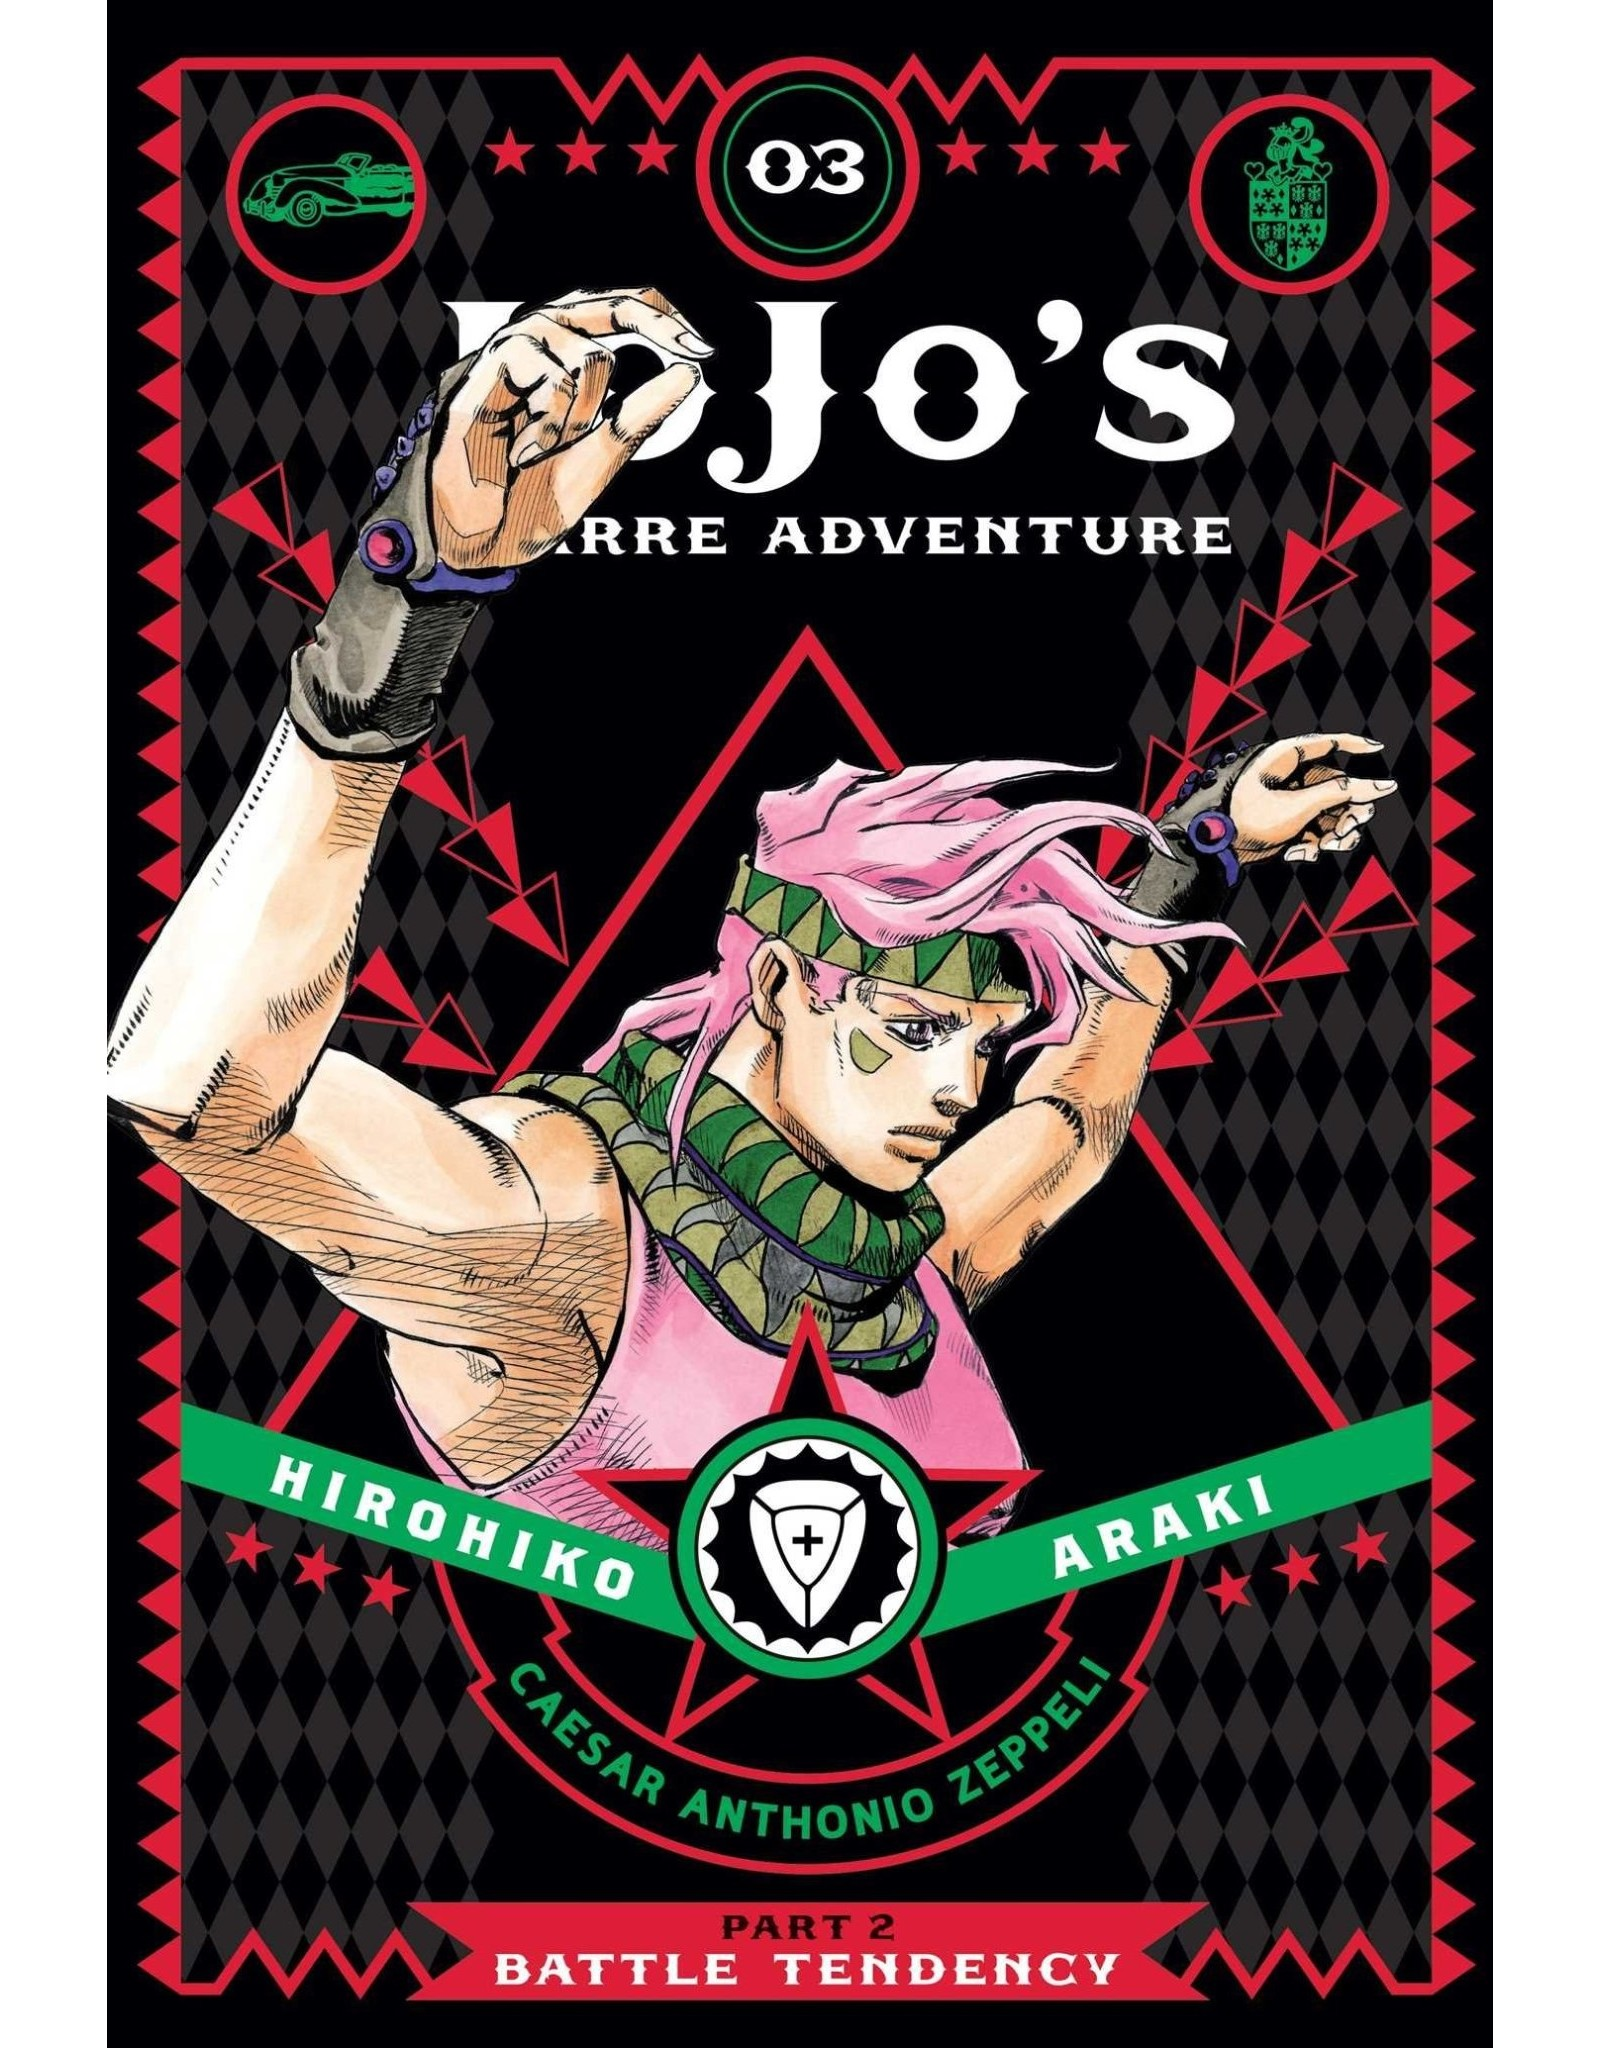 Jojo's Bizarre Adventure - Part 2: Battle Tendency - Volume 3 - Hardcover (Engelstalig)